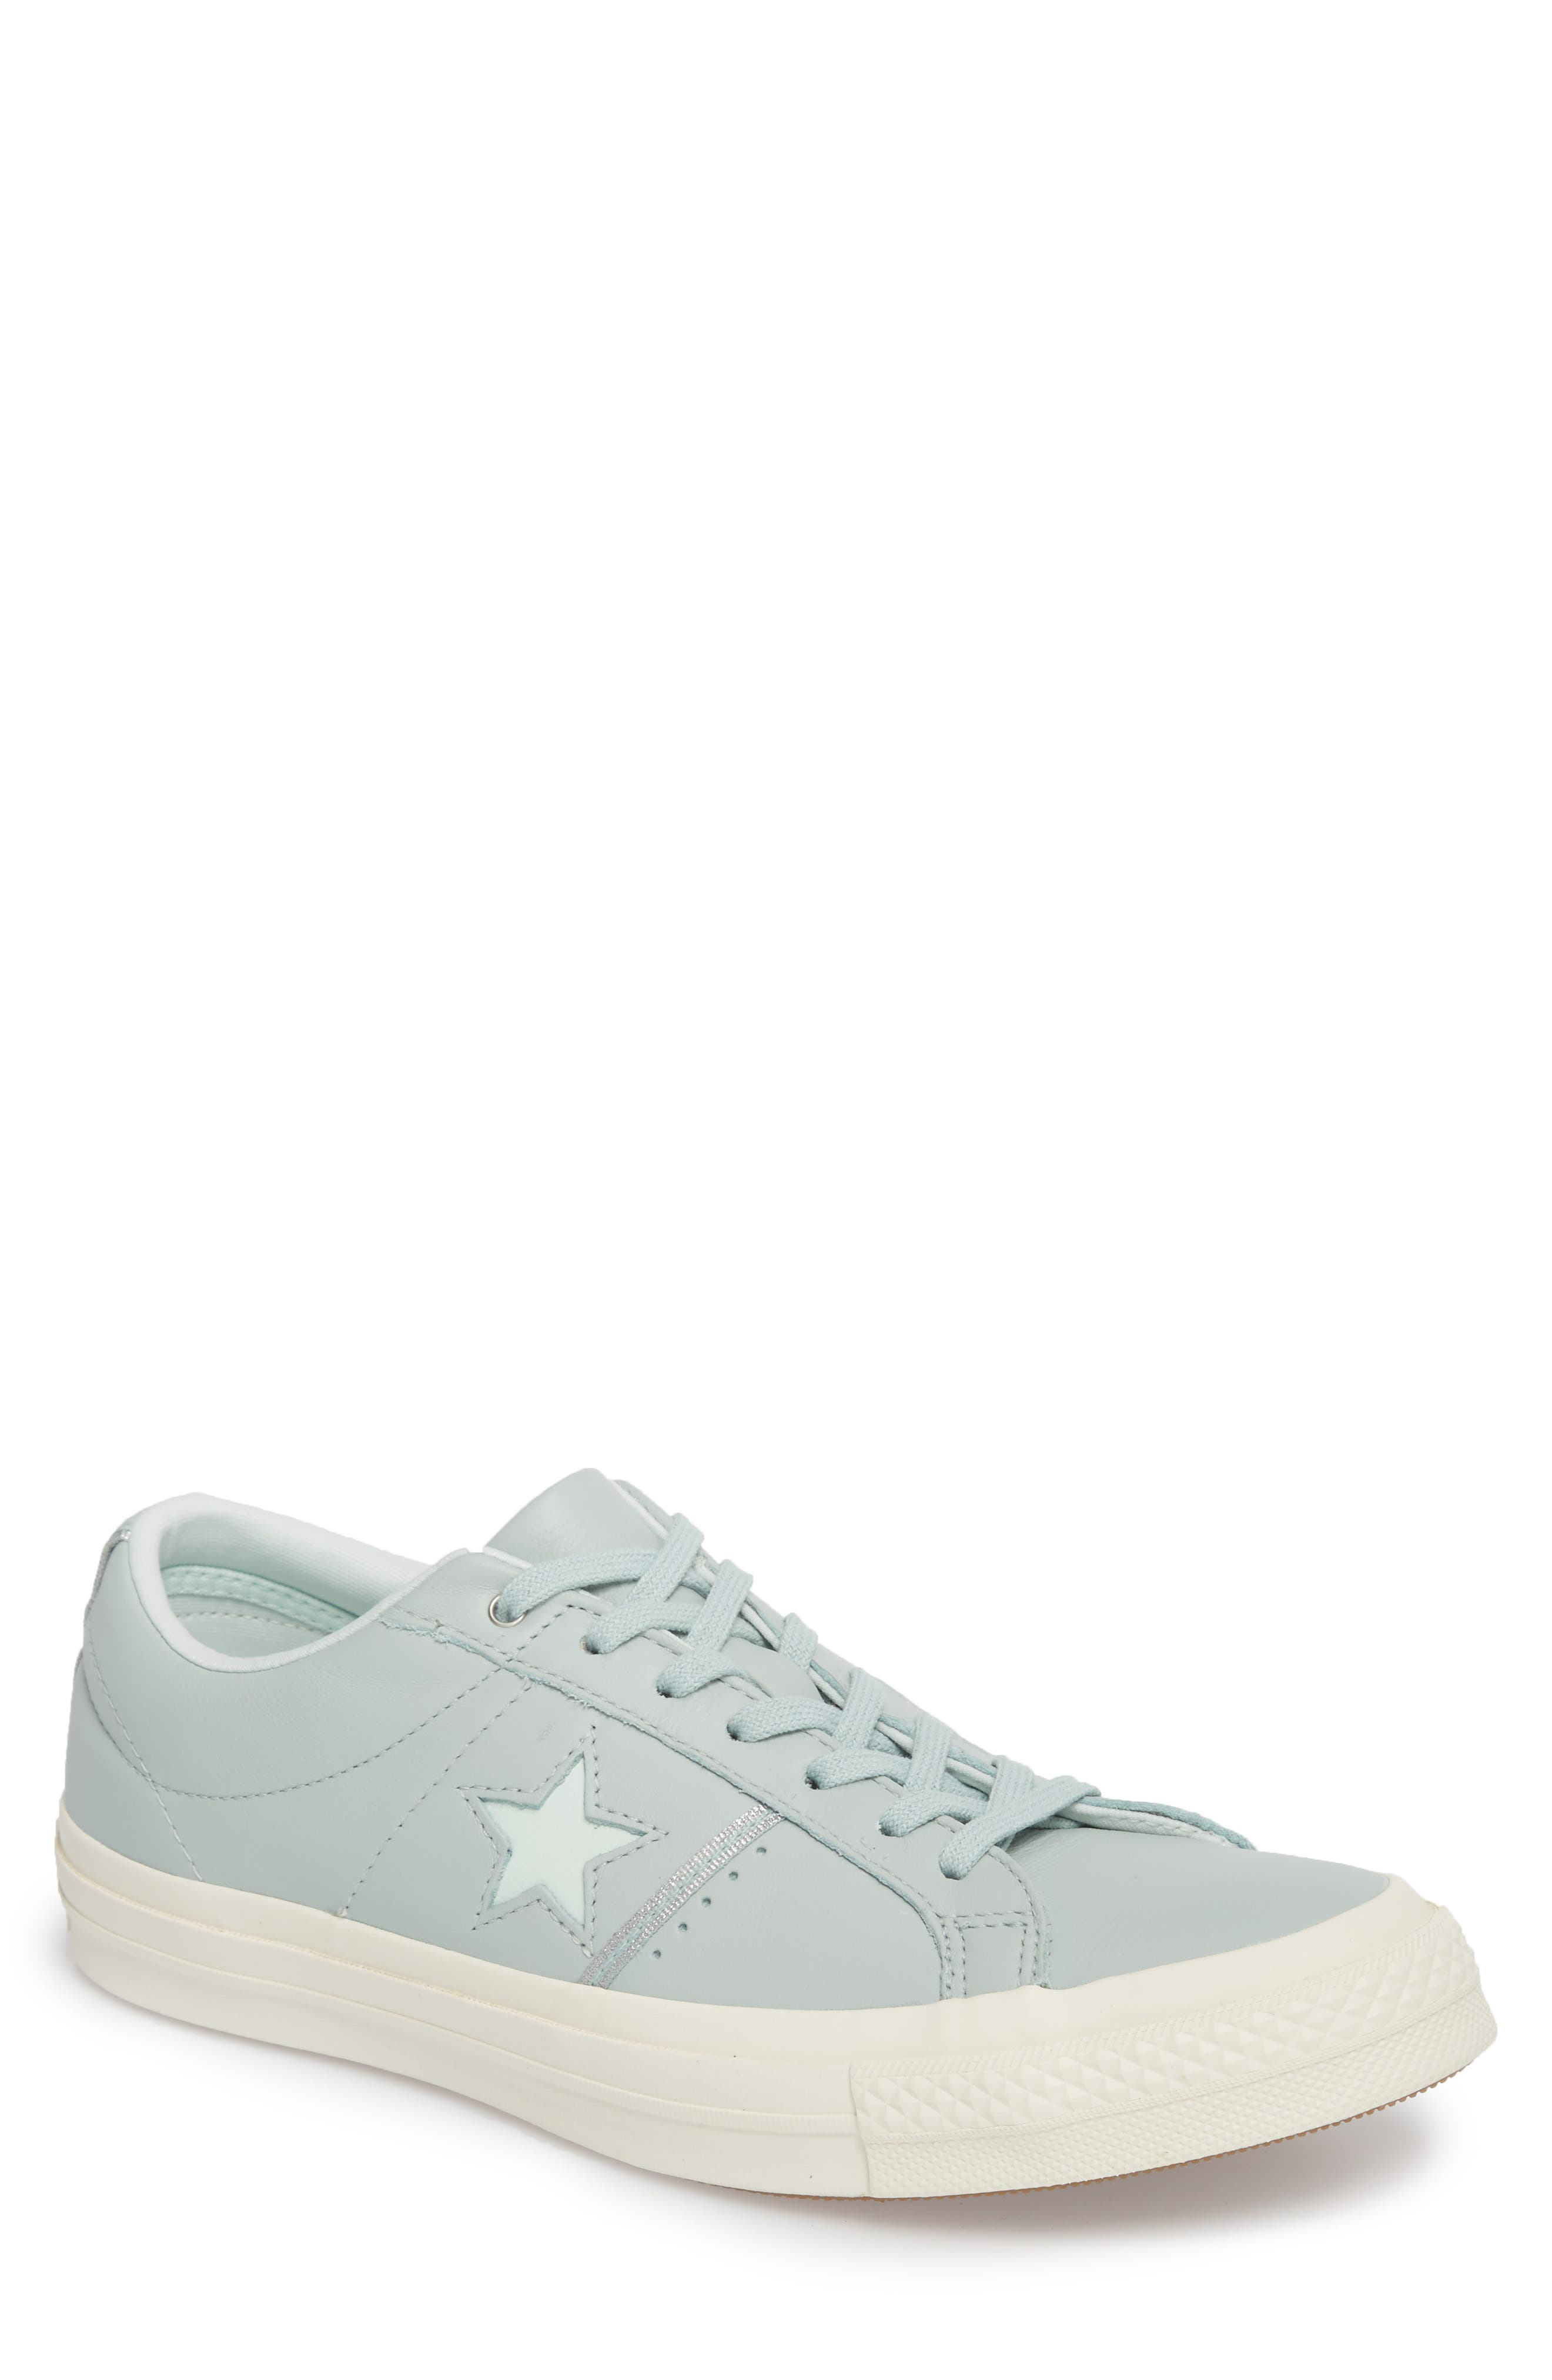 Chuck Taylor<sup>®</sup> One Star Piping Sneaker,                             Main thumbnail 1, color,                             026